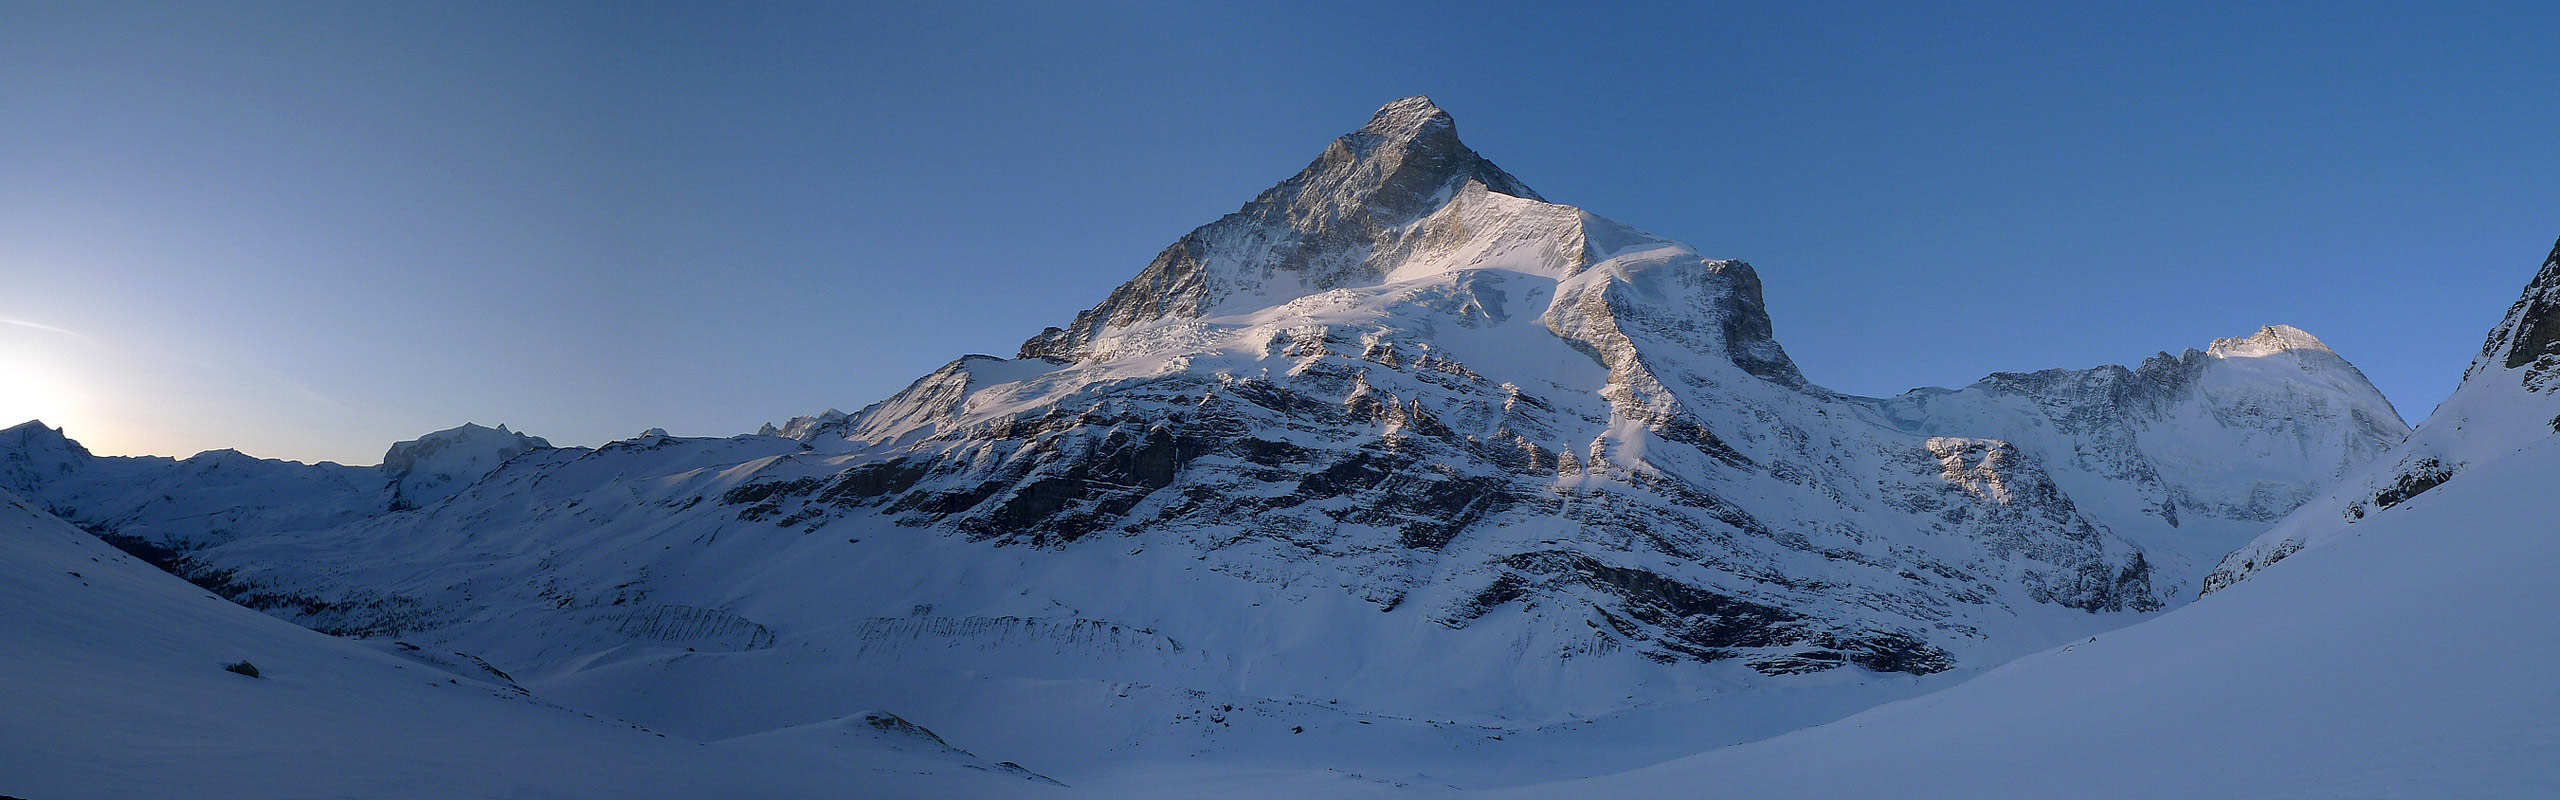 Mont Durand / Arbenhorn Walliser Alpen / Alpes valaisannes Switzerland panorama 16